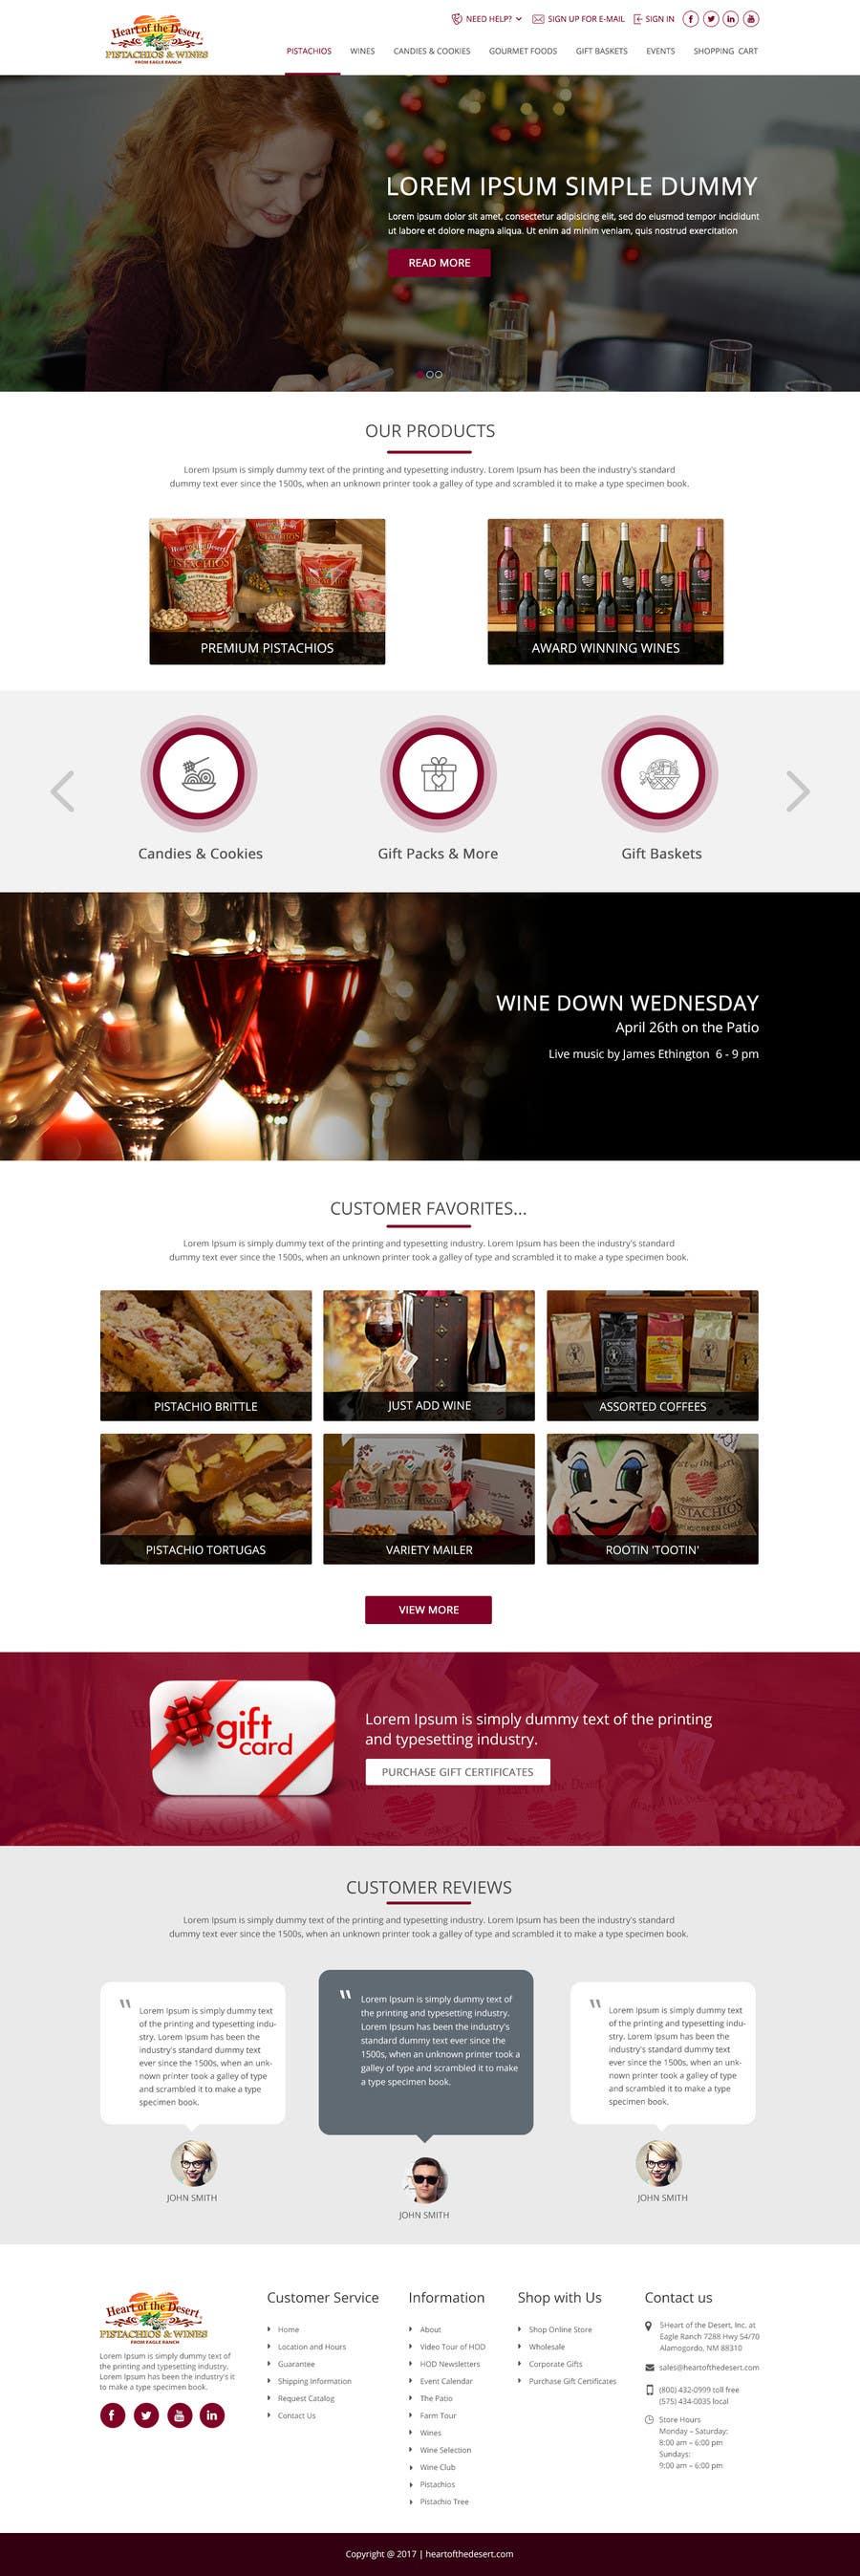 Proposition n°1 du concours Design a Website Mockup for E-commerce Site